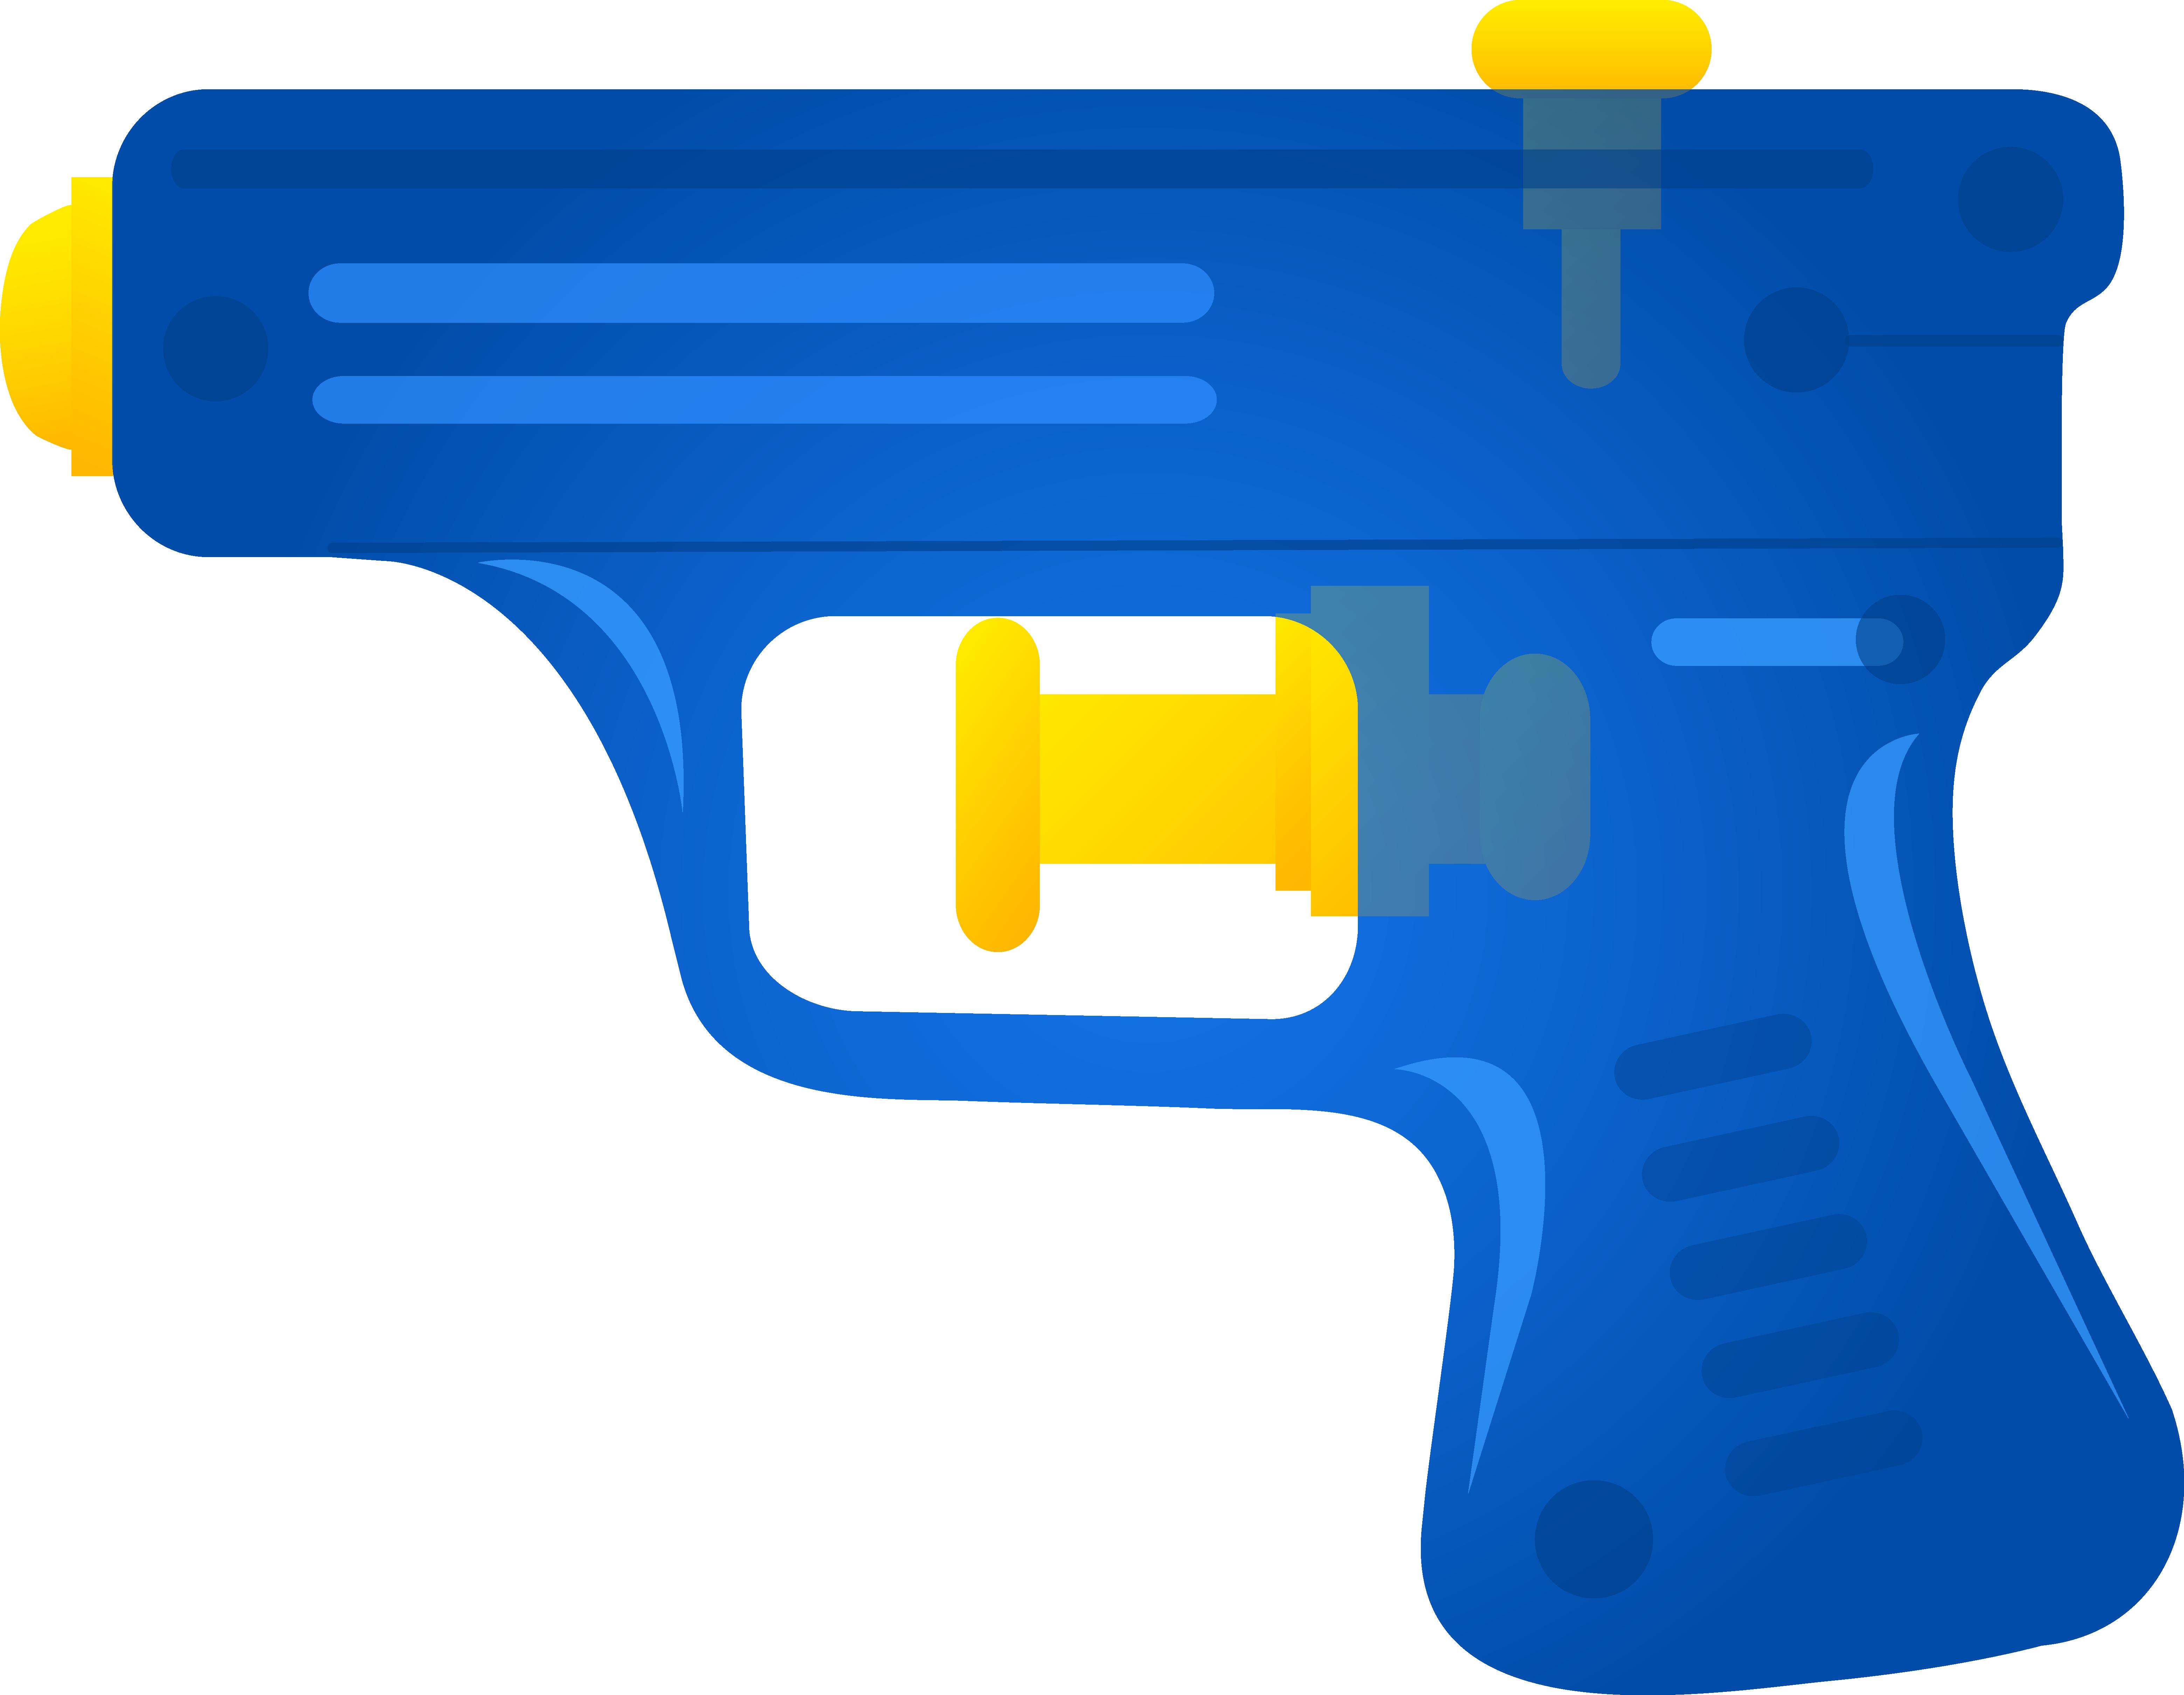 Blue Toy Squirt Gun.